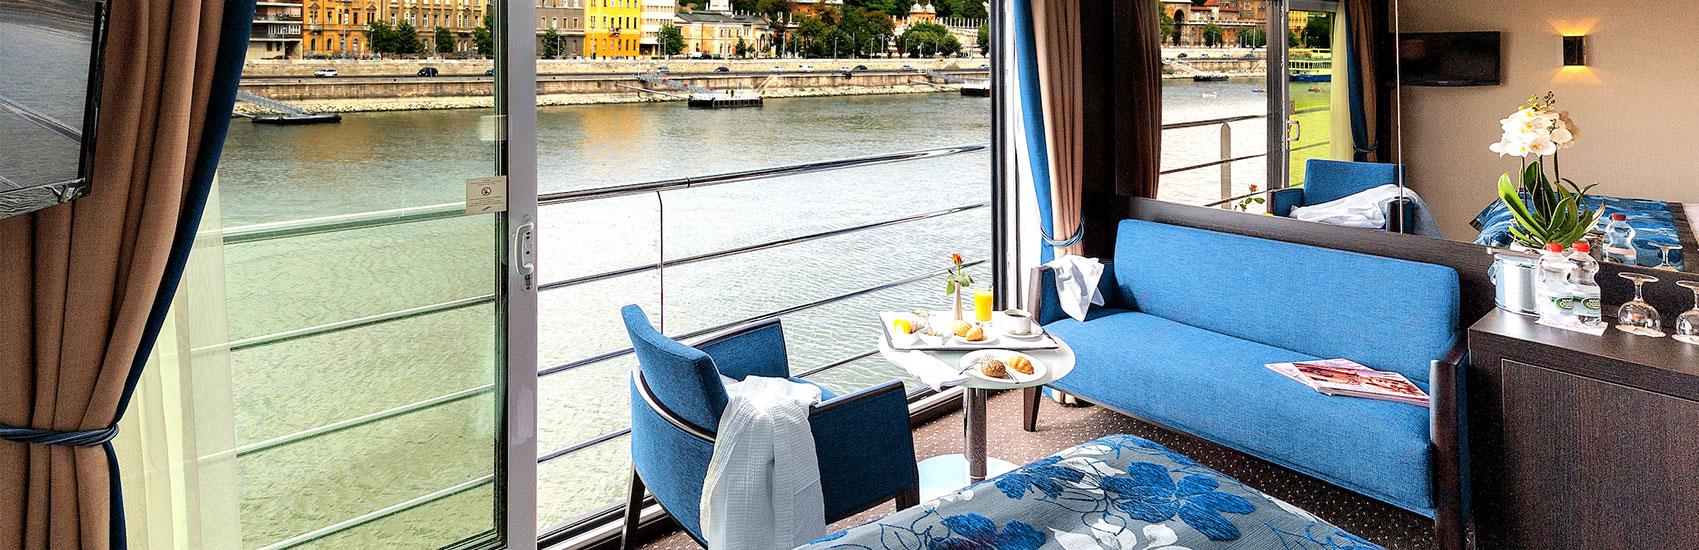 Free Airfare to Europe with Avalon Waterways 1